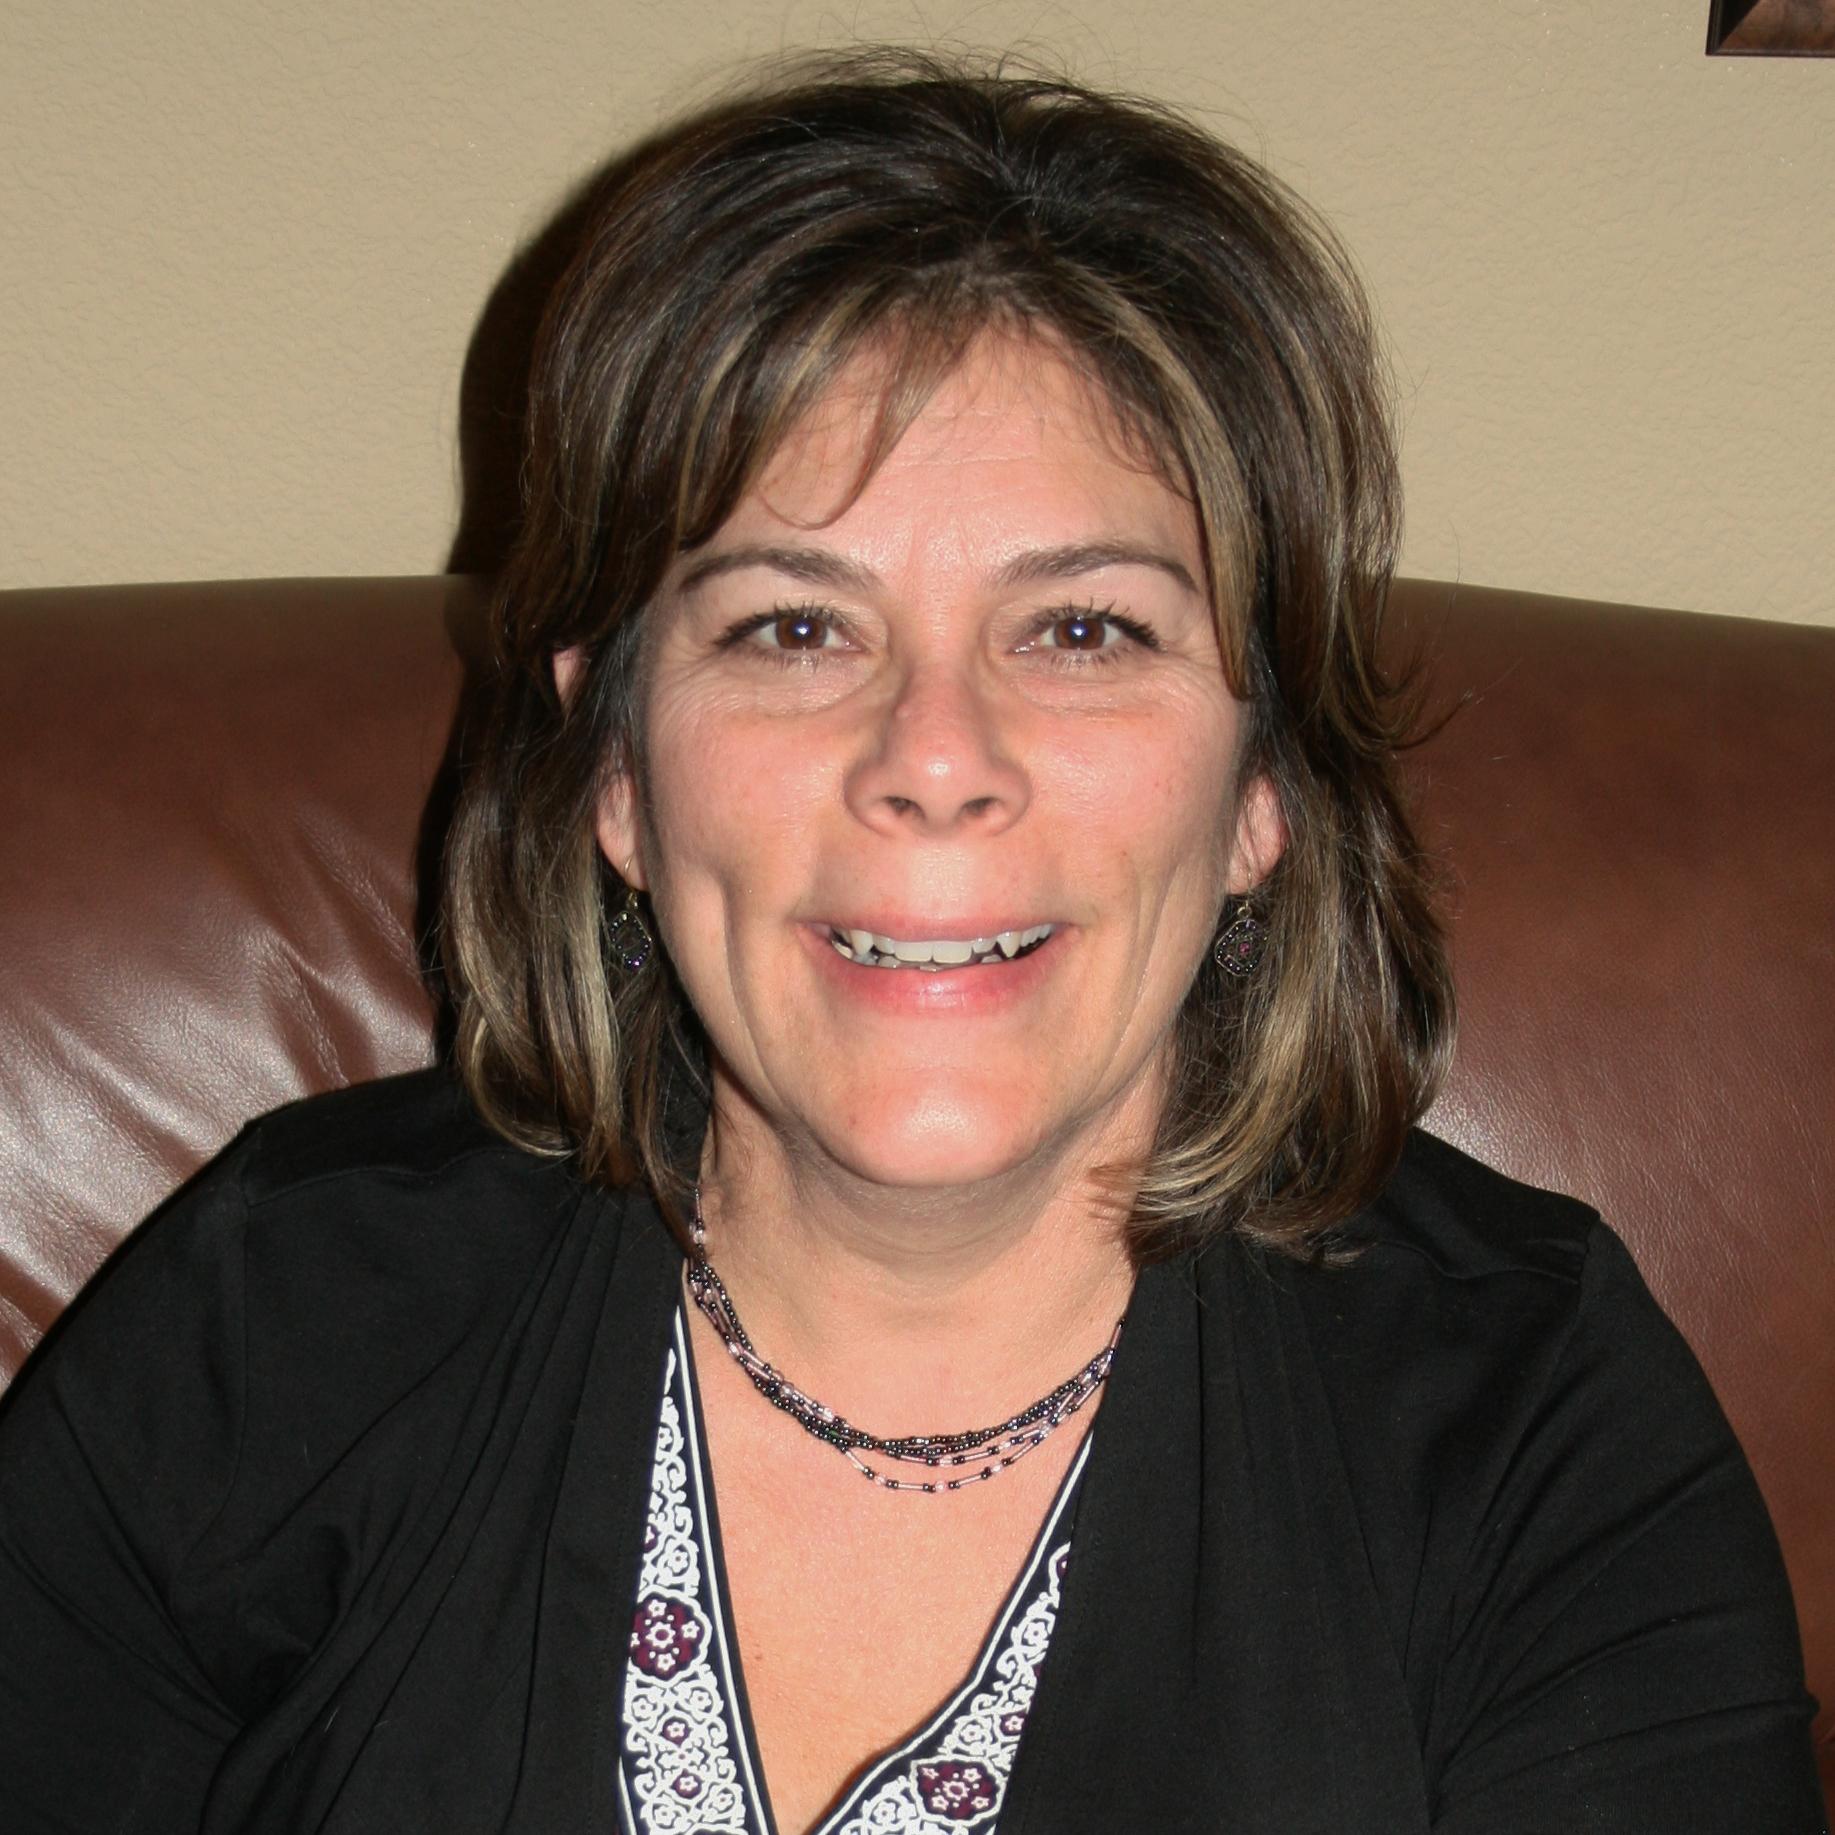 Debbie Tavernier